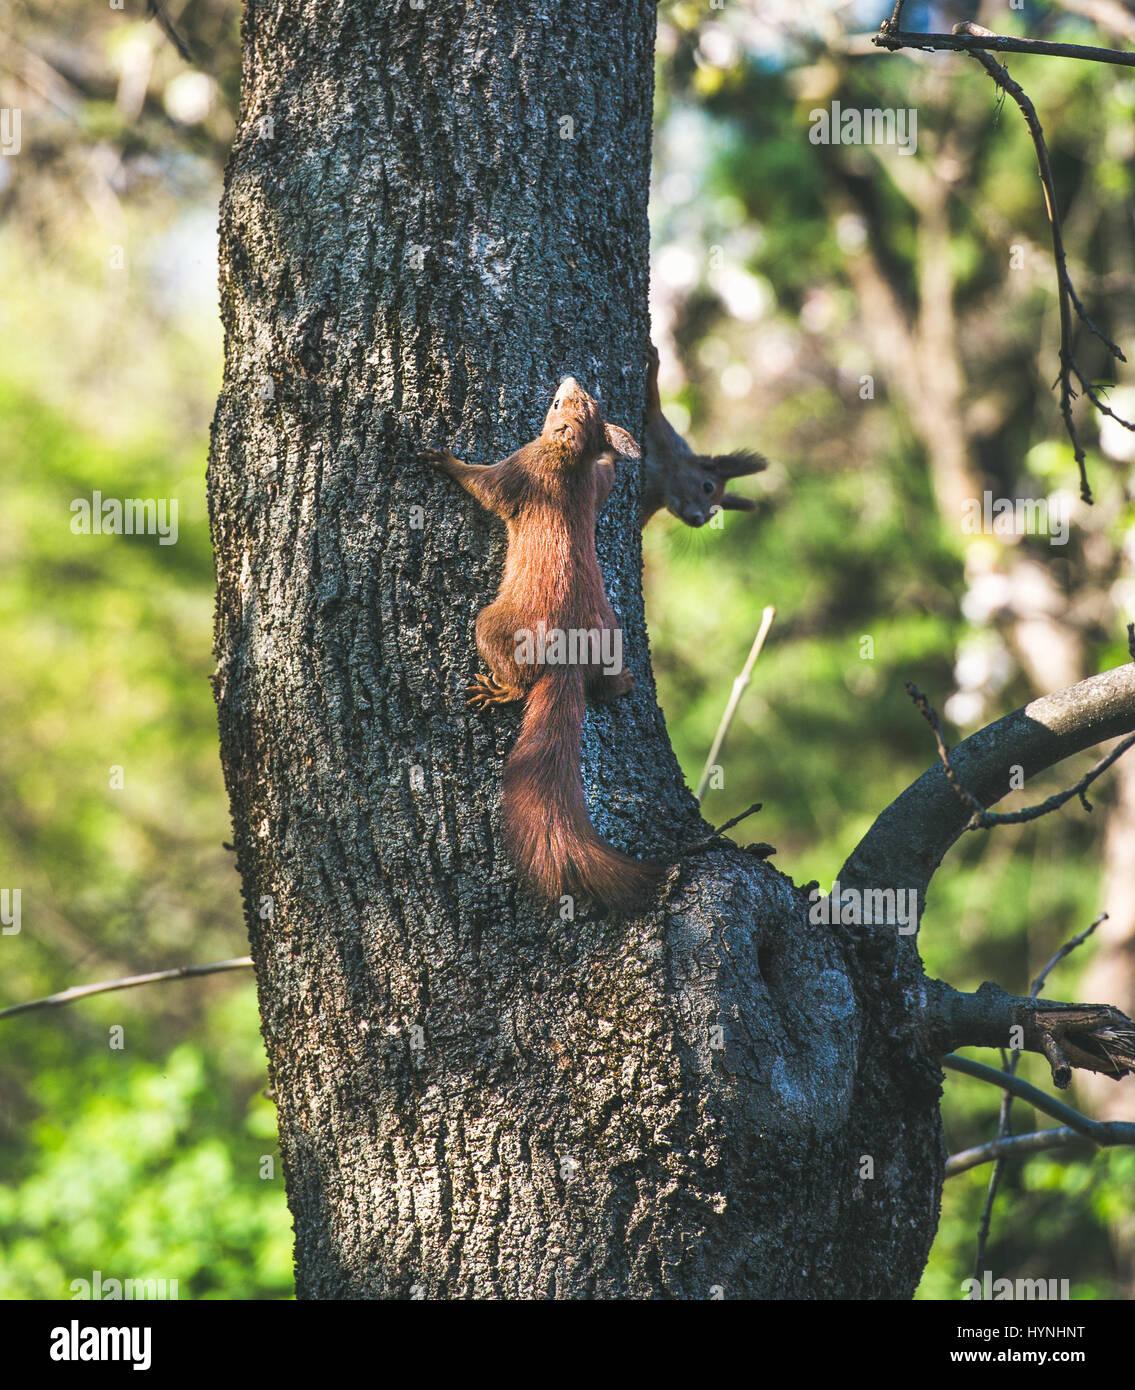 Squirrels climbing tree trunk in Gellert hill park in Budapest Stock Photo